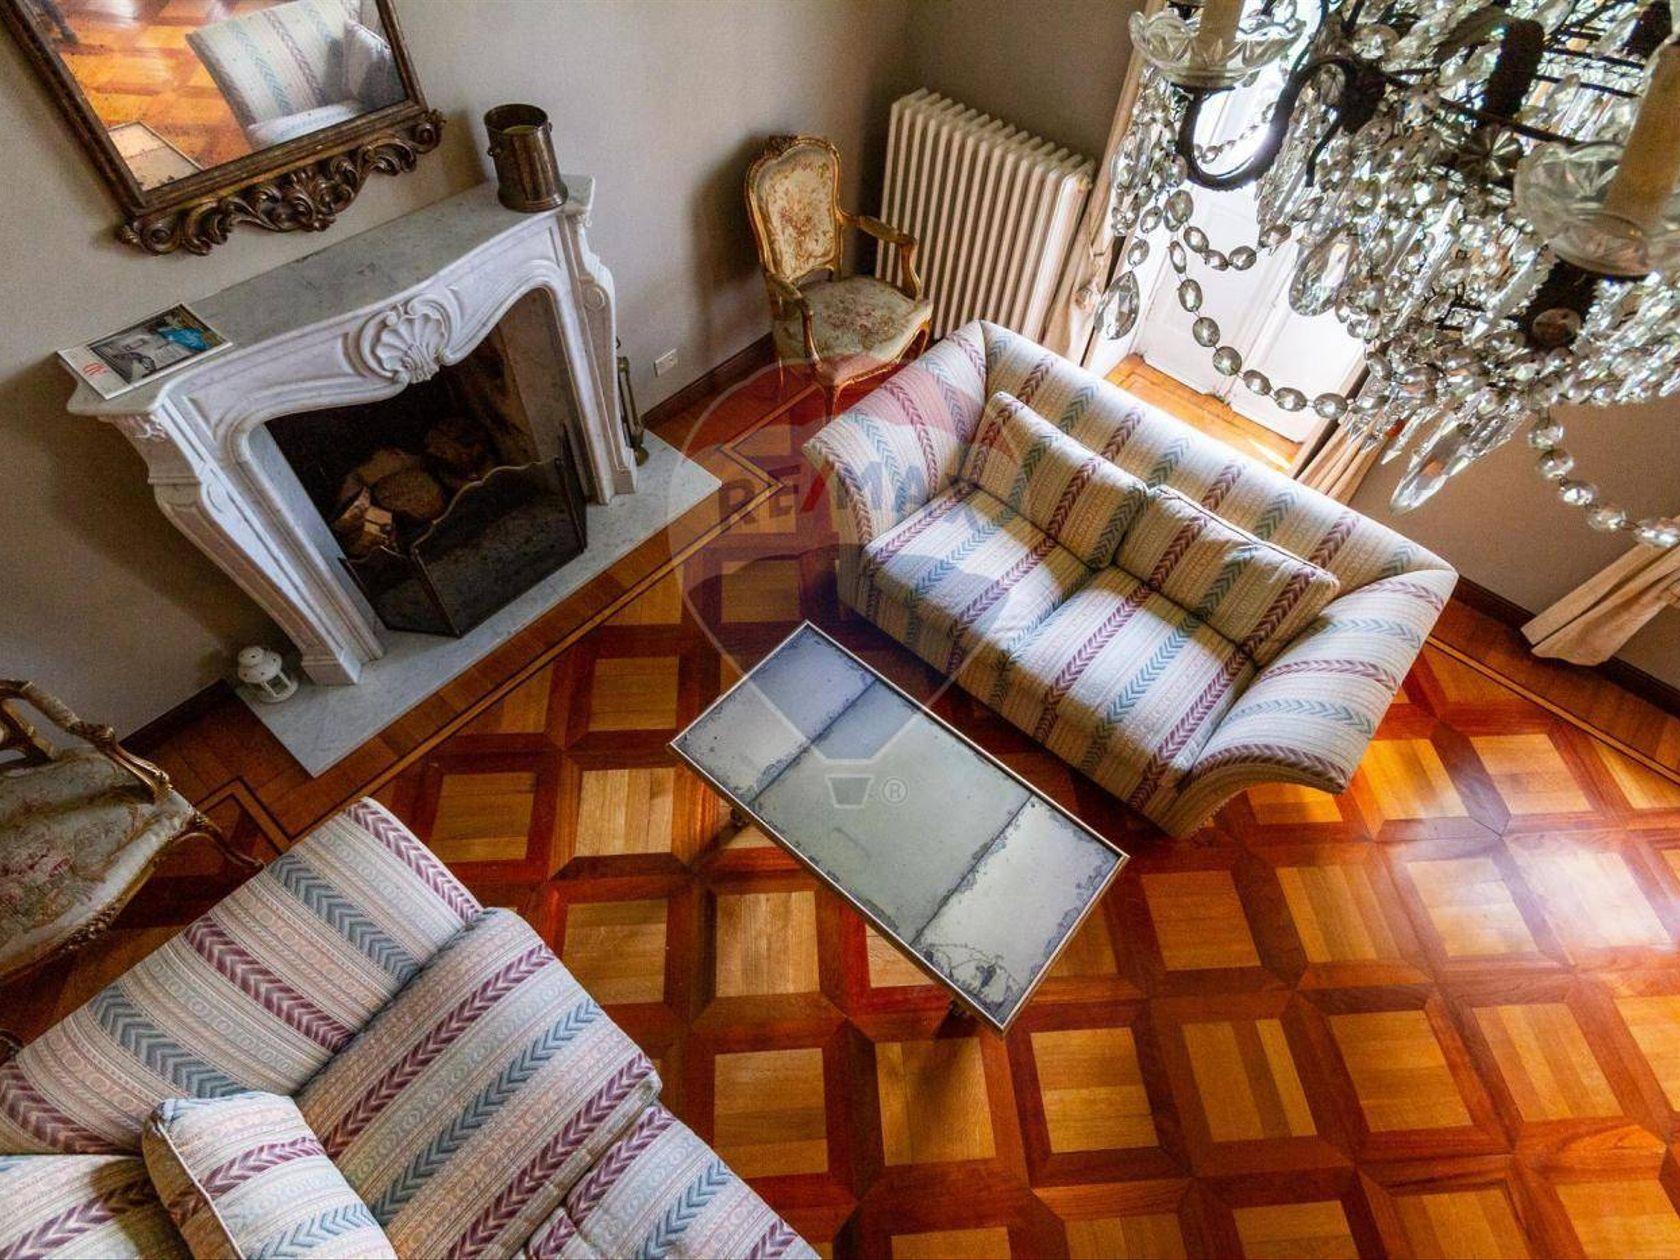 Casa Indipendente Torino-precollina Collina, Torino, TO Vendita - Foto 41